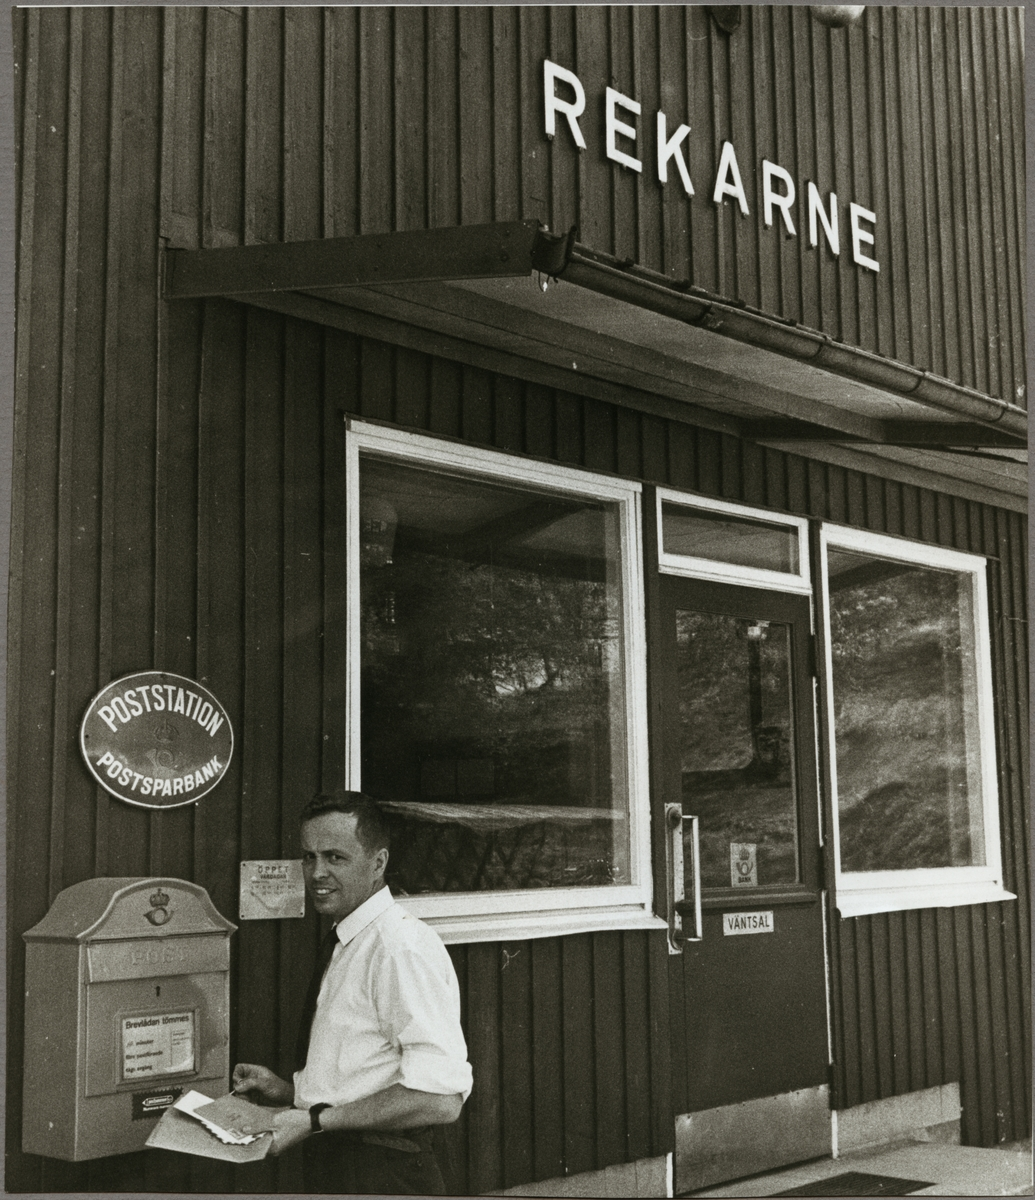 Posthantering, Rekarne stationshus.